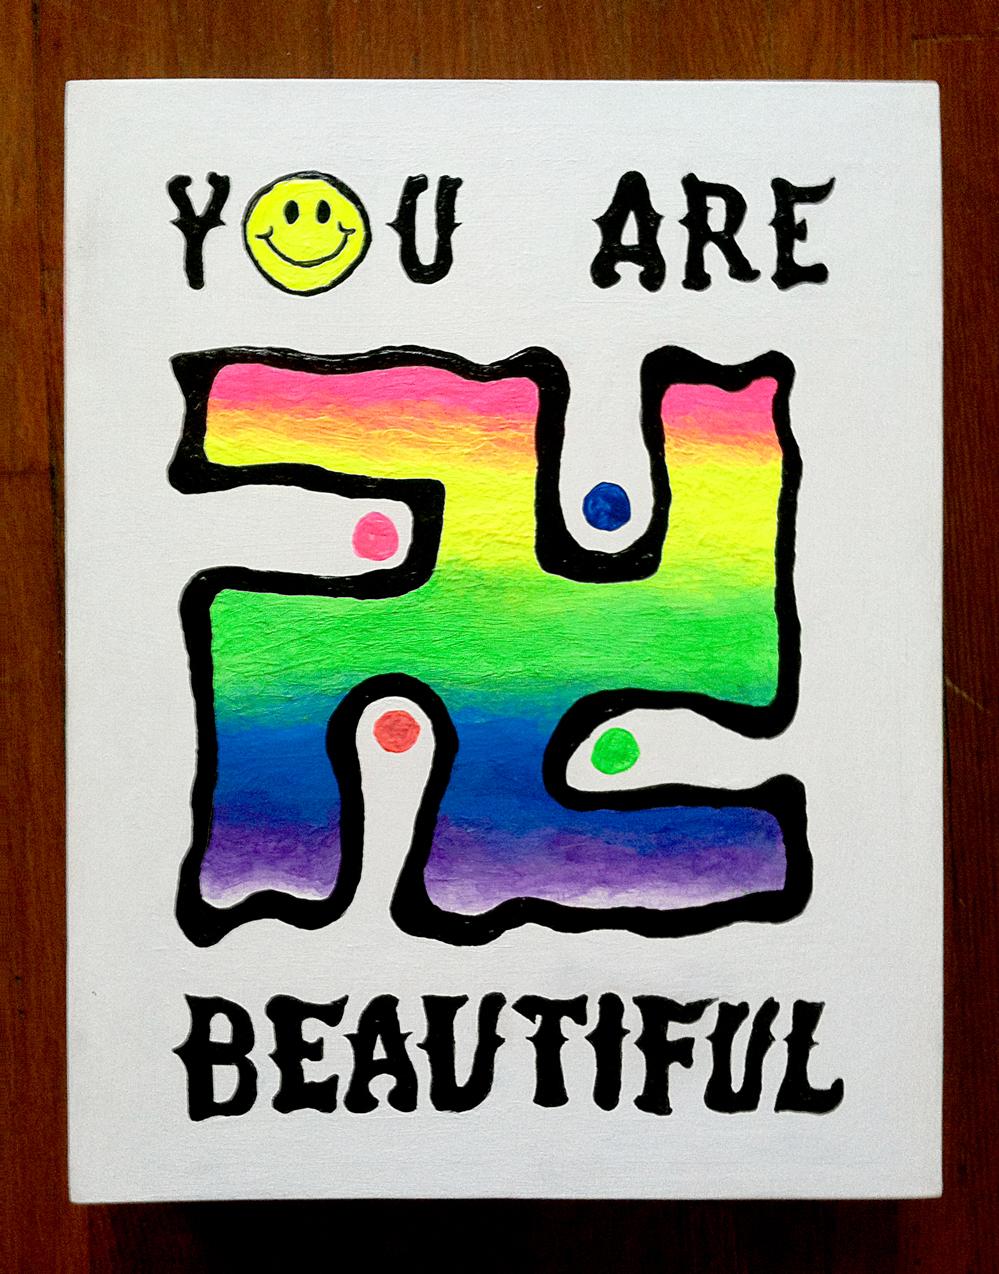 Rainbow Swastika - You Are Beautiful - painting by Sinjun